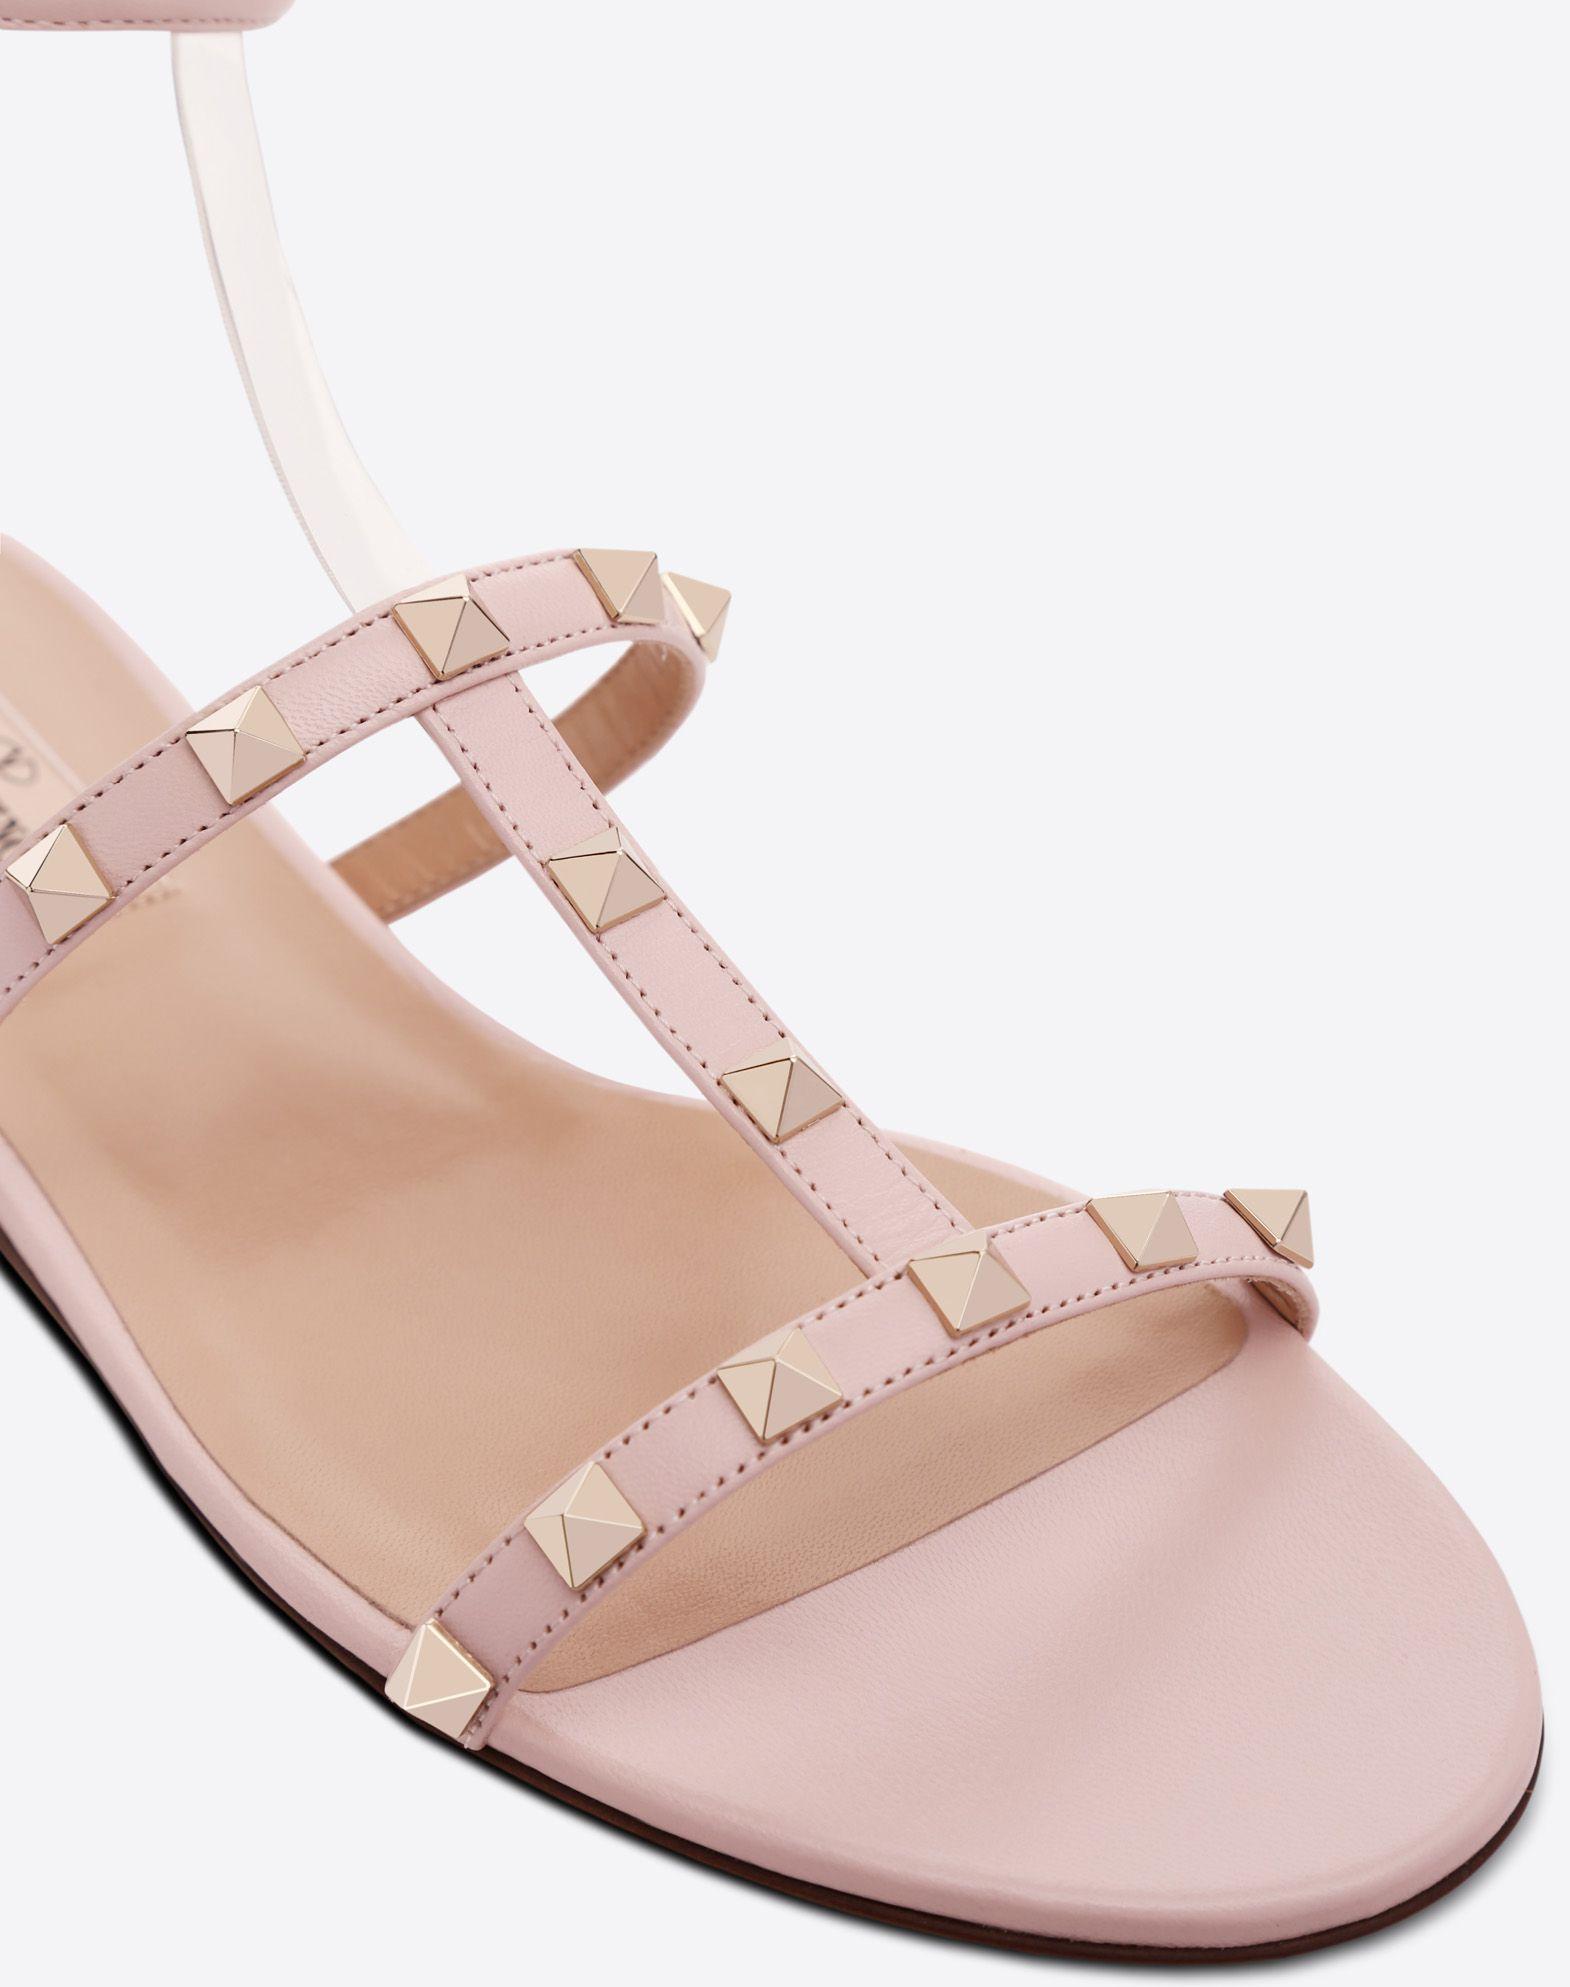 VALENTINO GARAVANI See-through flat sandal FLAT SANDALS D b